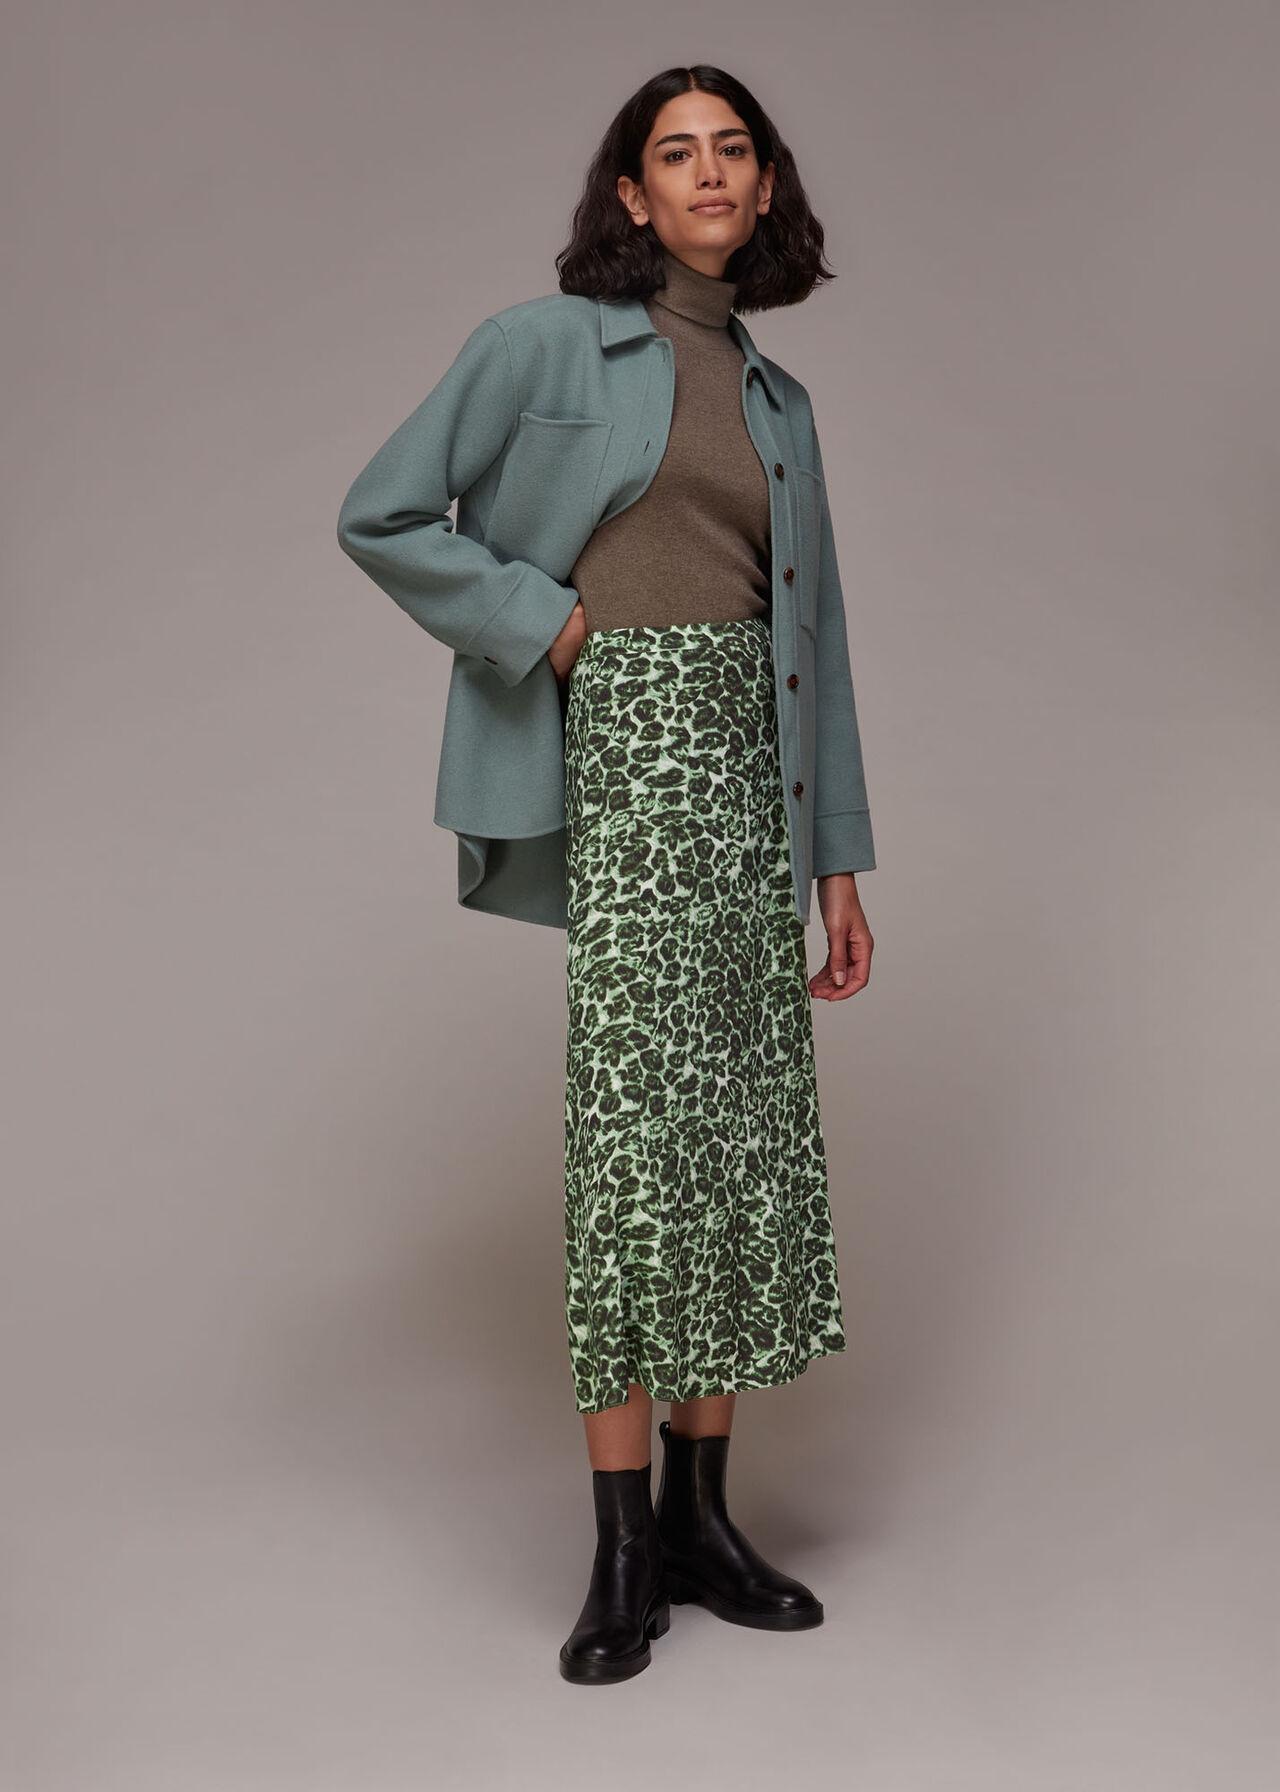 Clouded Leopard Skirt